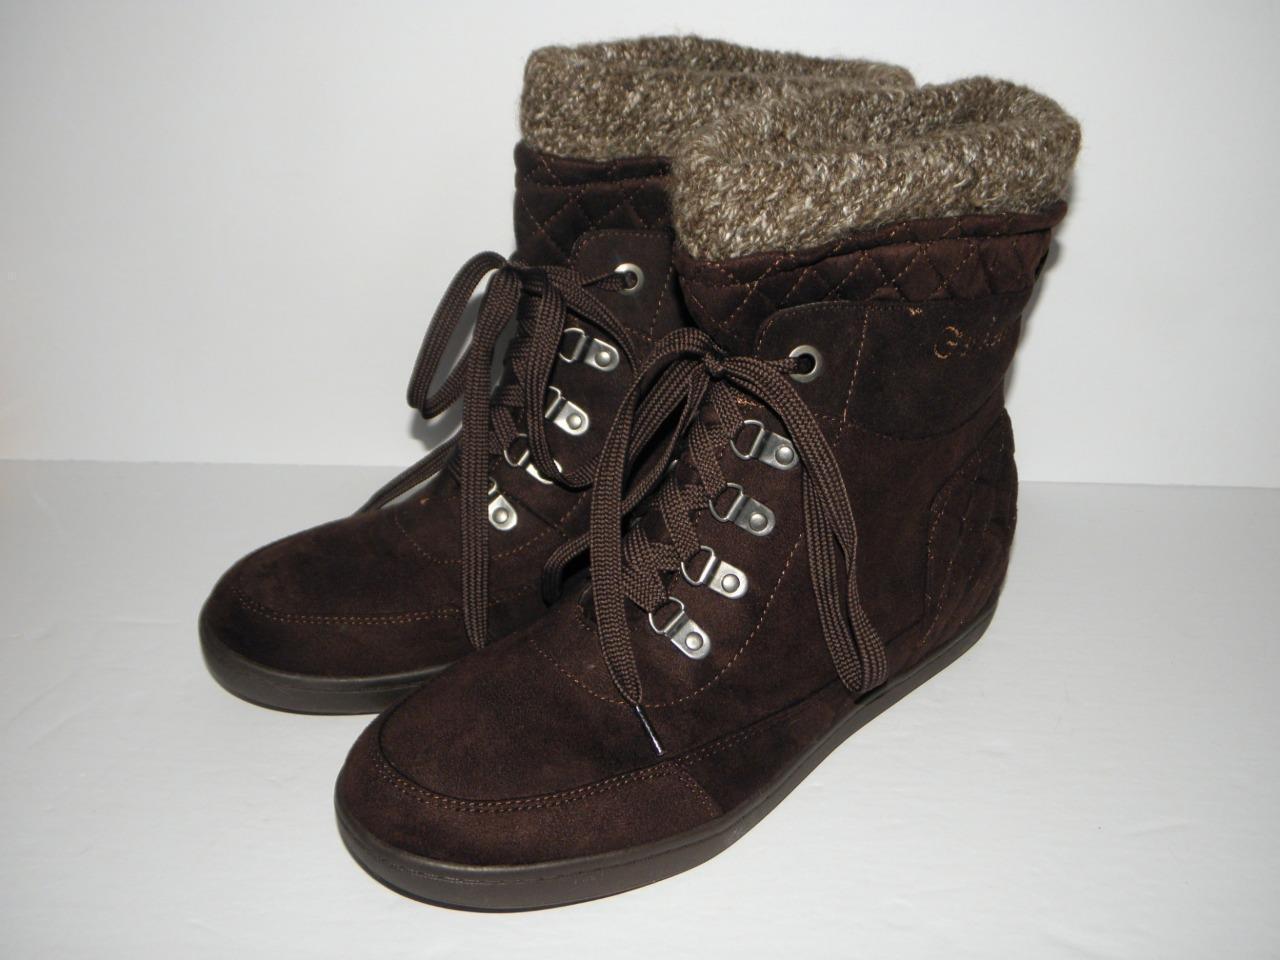 G by Guess Womens PUCK Dark Dark Dark Brown Fabric Quilt Design Boots size 10 Medium (NEW) 6529d0